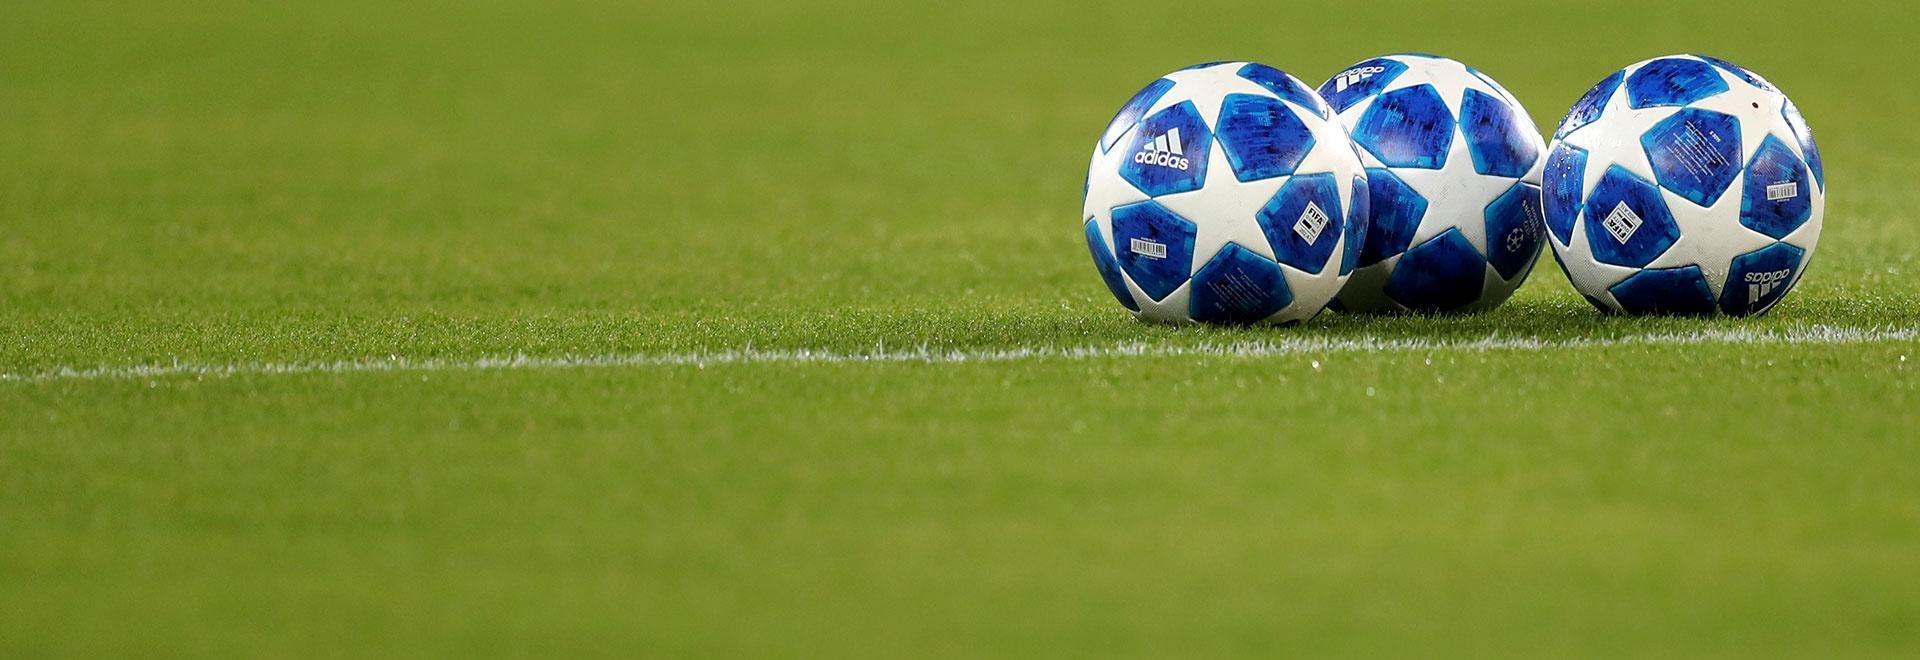 Bayern M. - Inter 2010